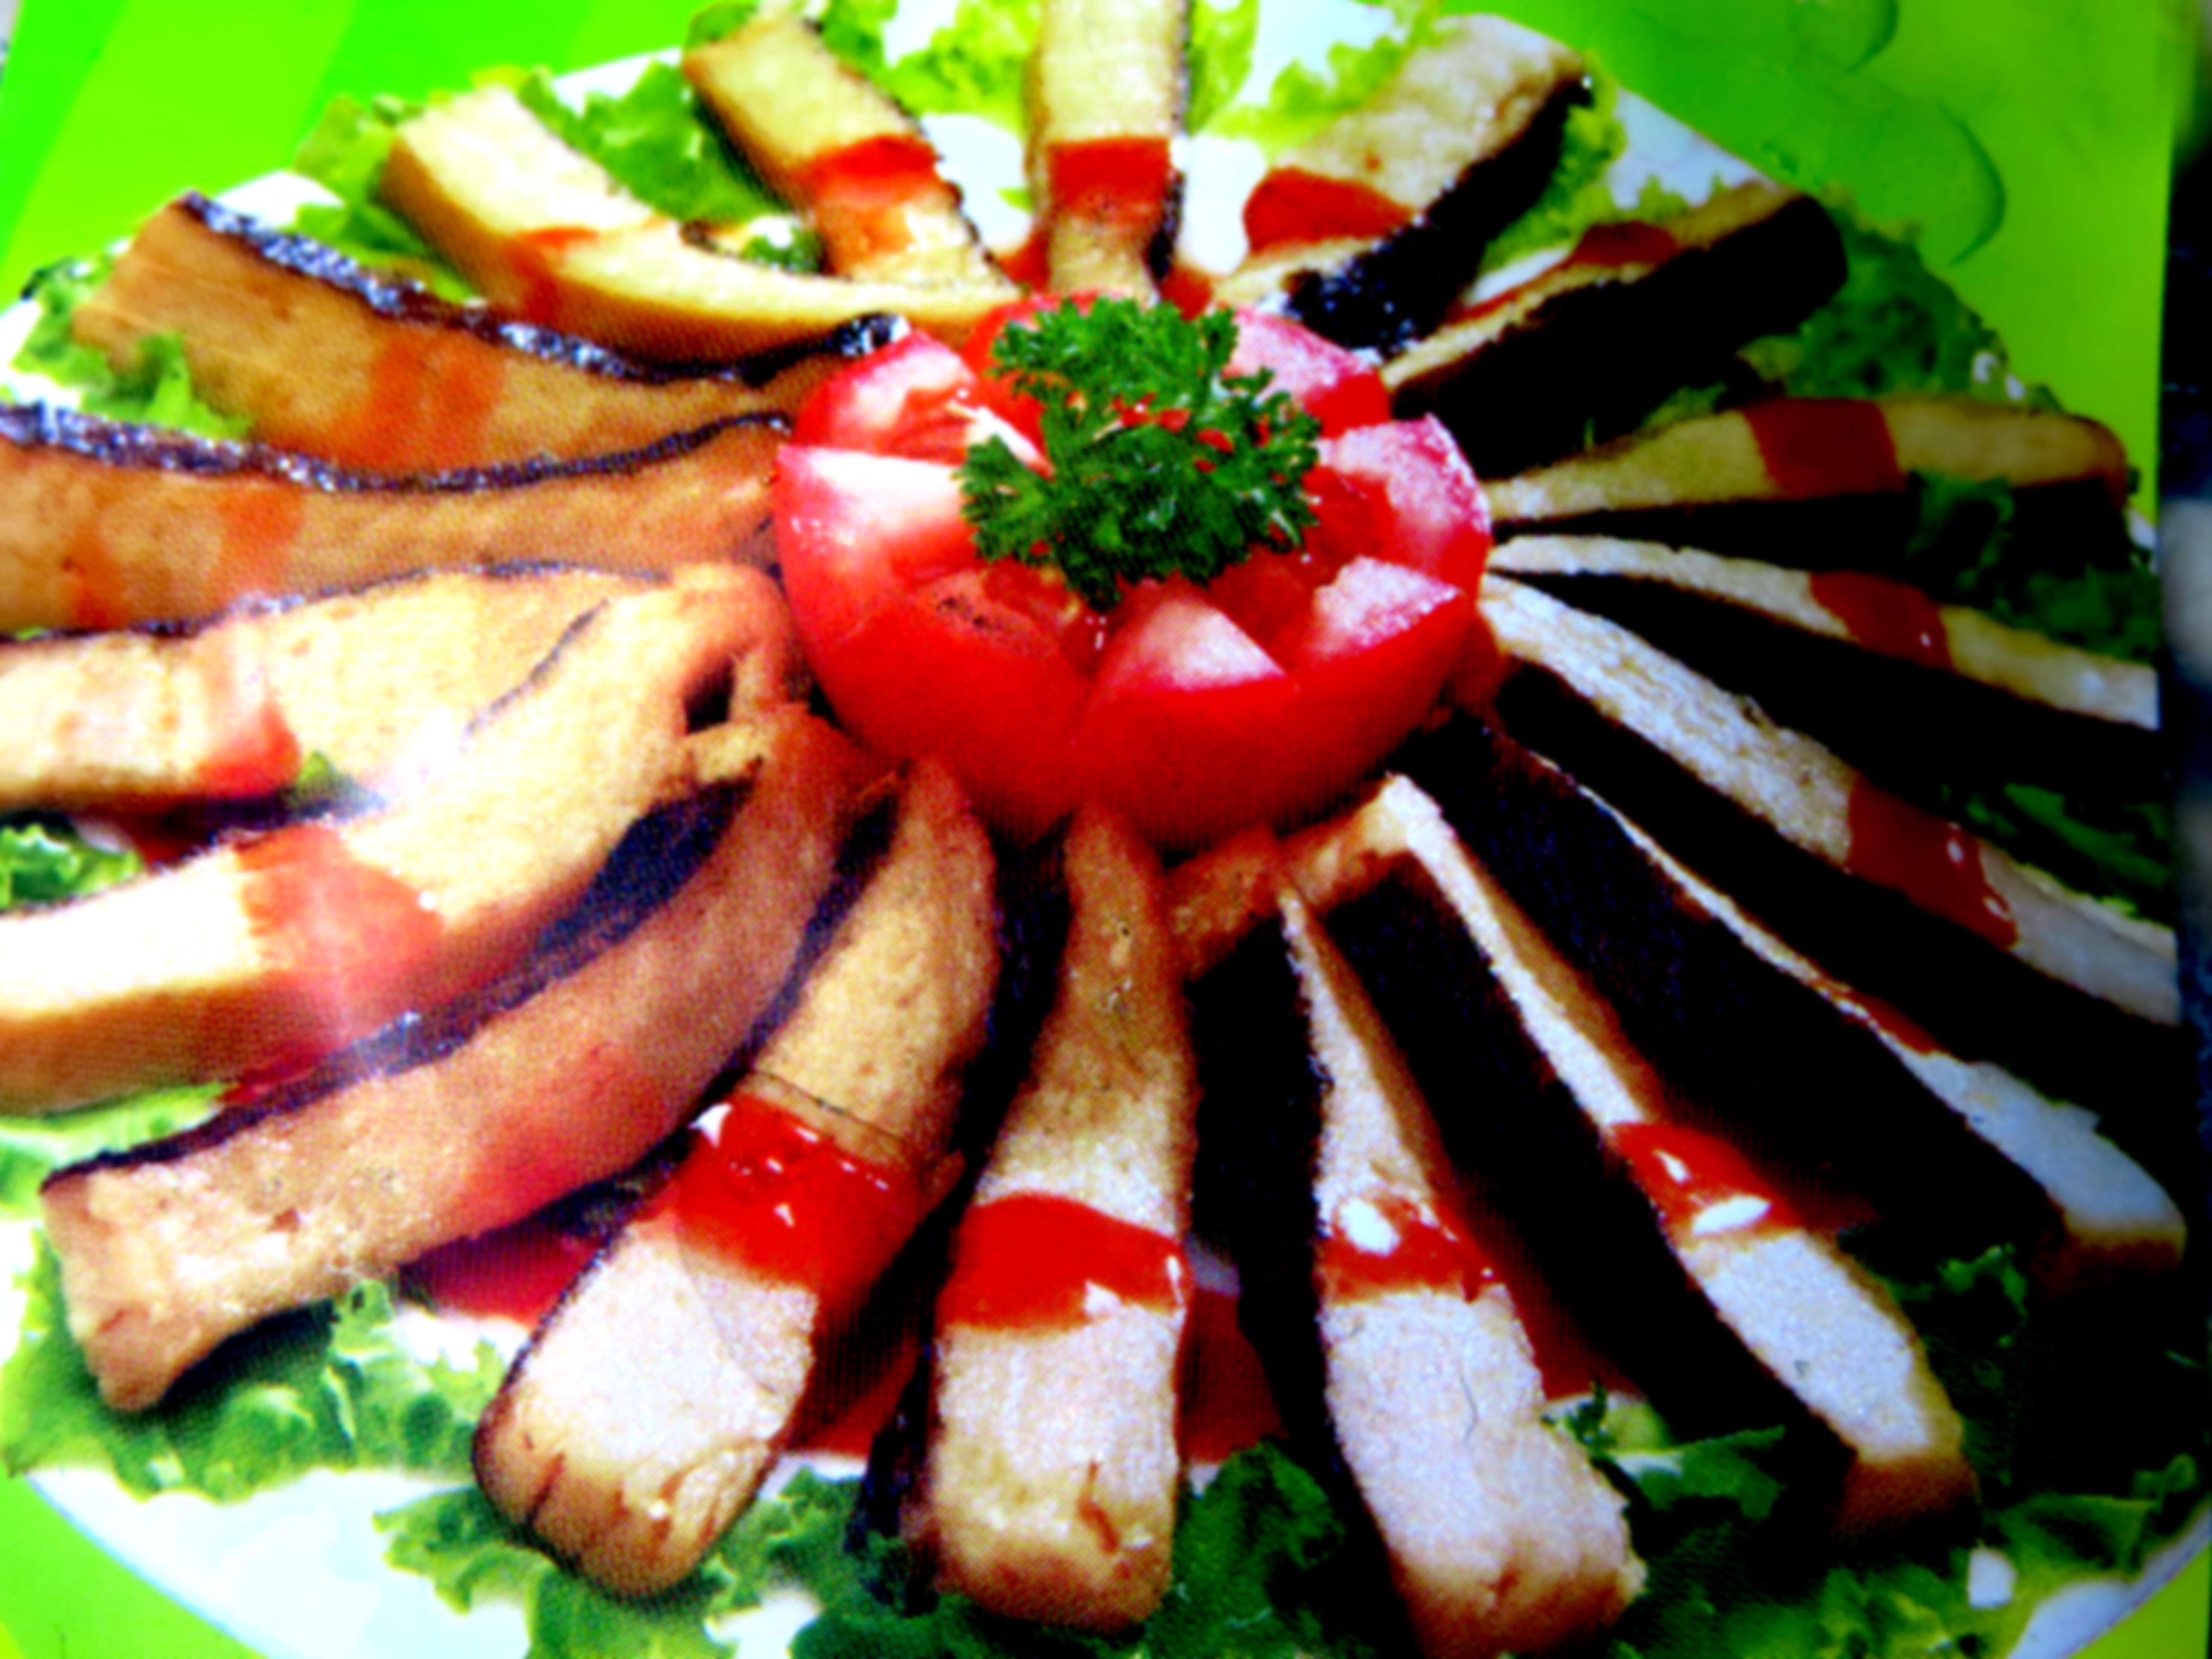 Image Friendly Fish Slice 善缘 - 香酥片片 990grams